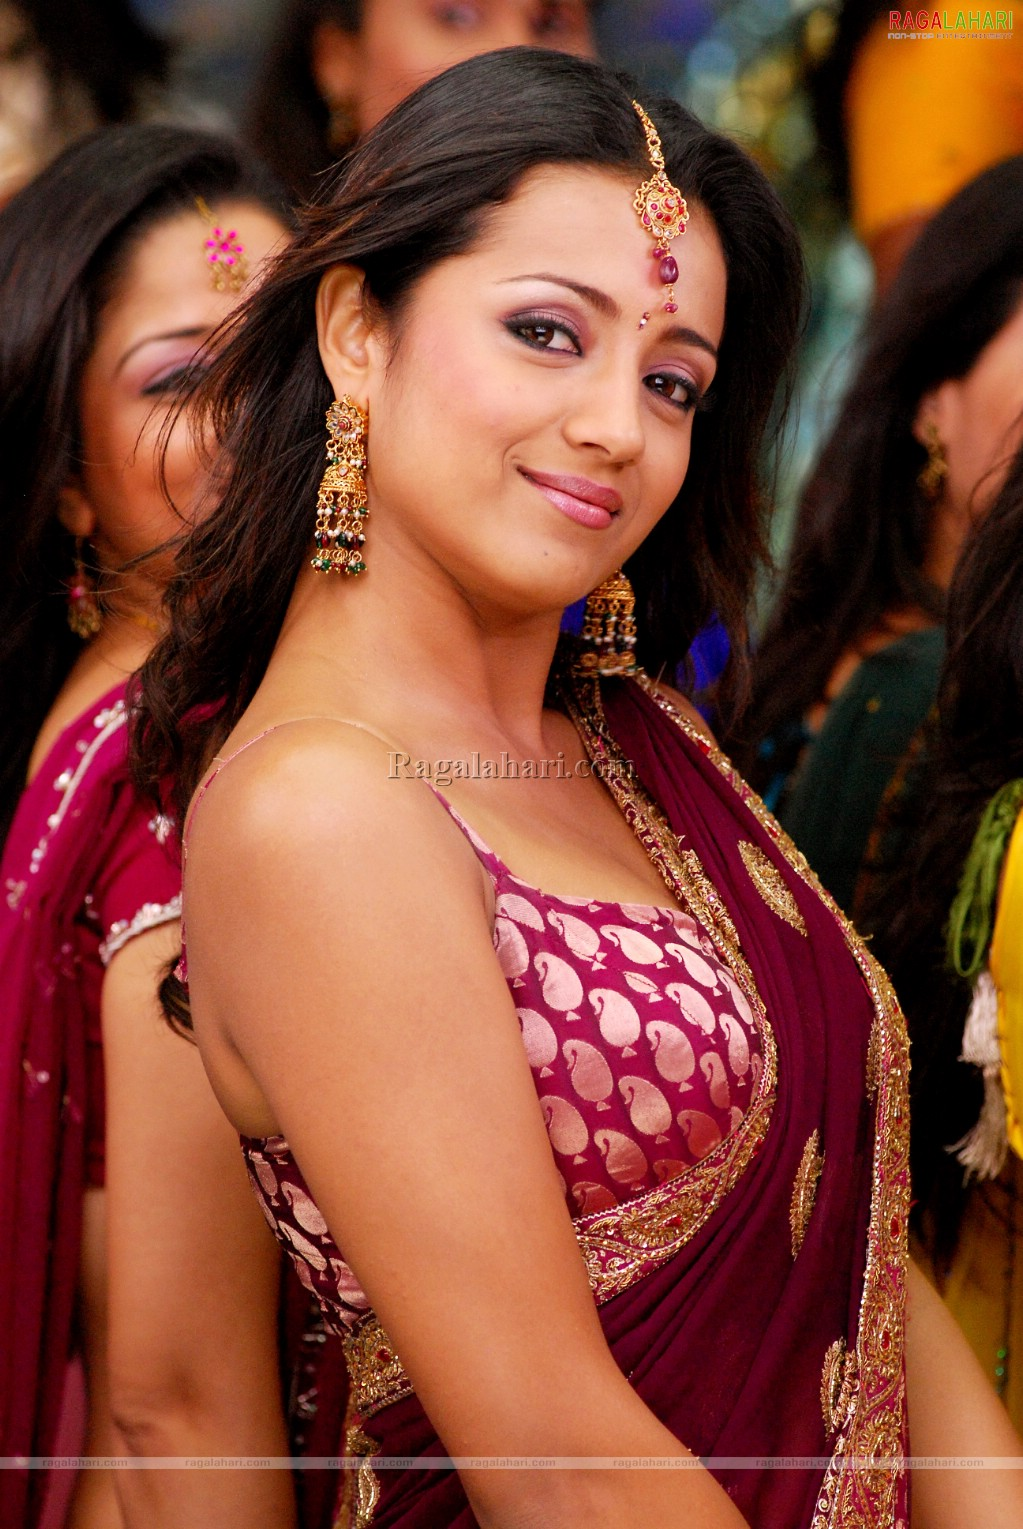 Spicy Tamil Actress Trisha Krishnan Hot N Hd No Download